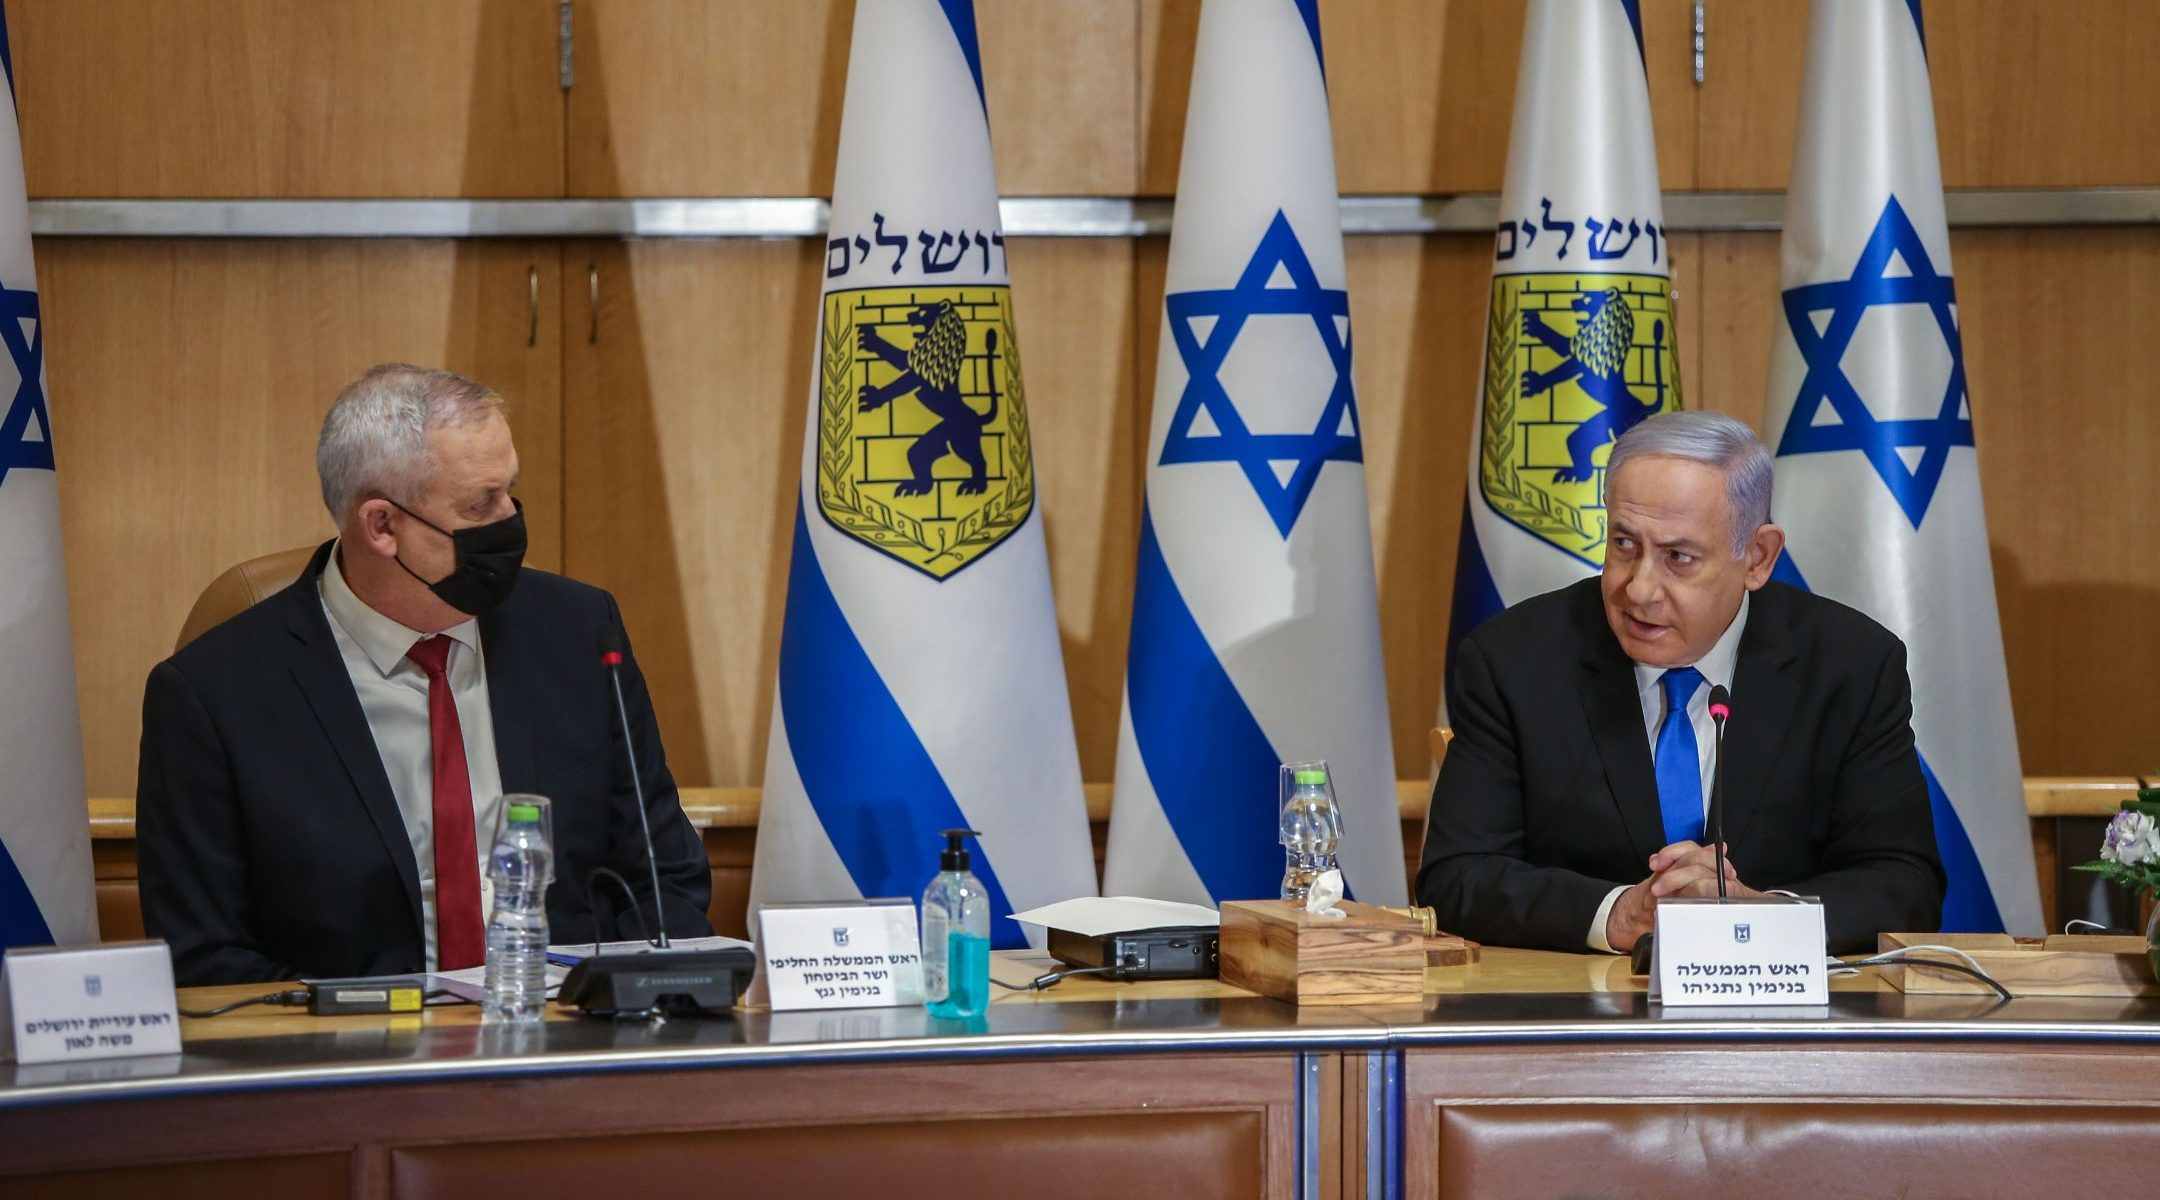 Israeli Prime Minister Benjamin Netanyahu, (right) and Defense Minister Benny Gantz at the weekly Cabinet meeting, at Jerusalem City Hall, May 9, 2021. (Photo/JTA-Amit Shabi)